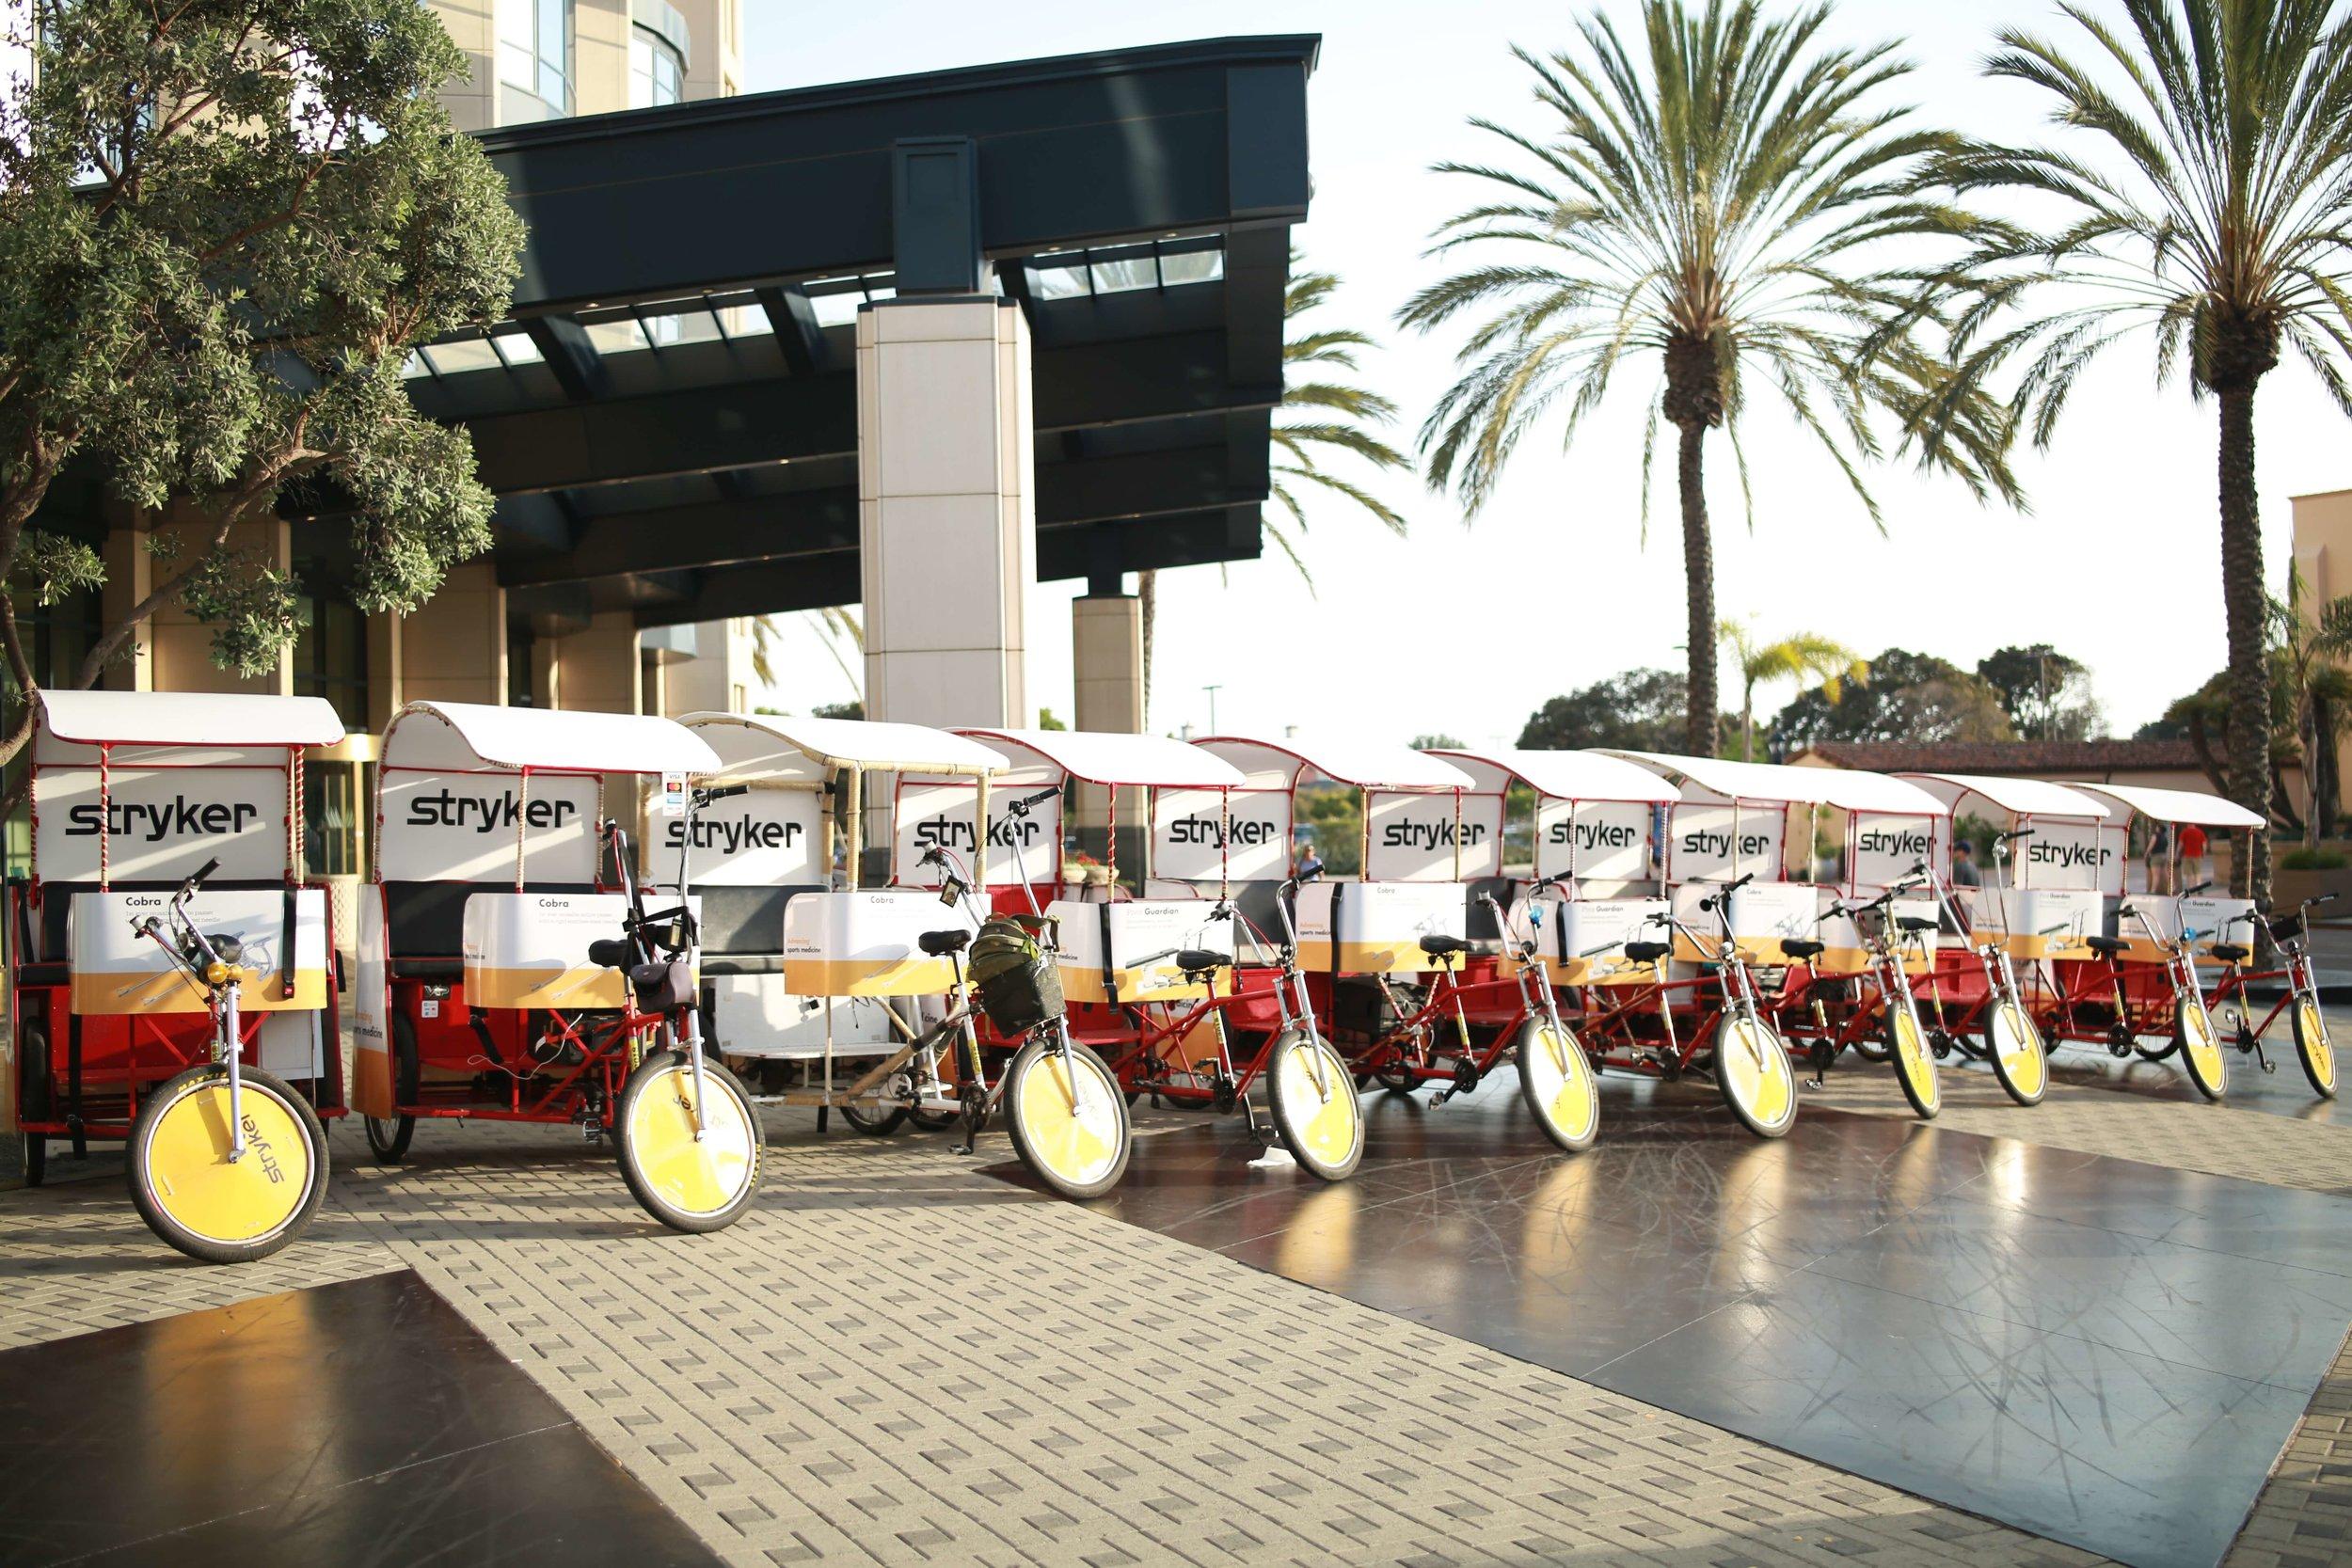 stryker pedicab